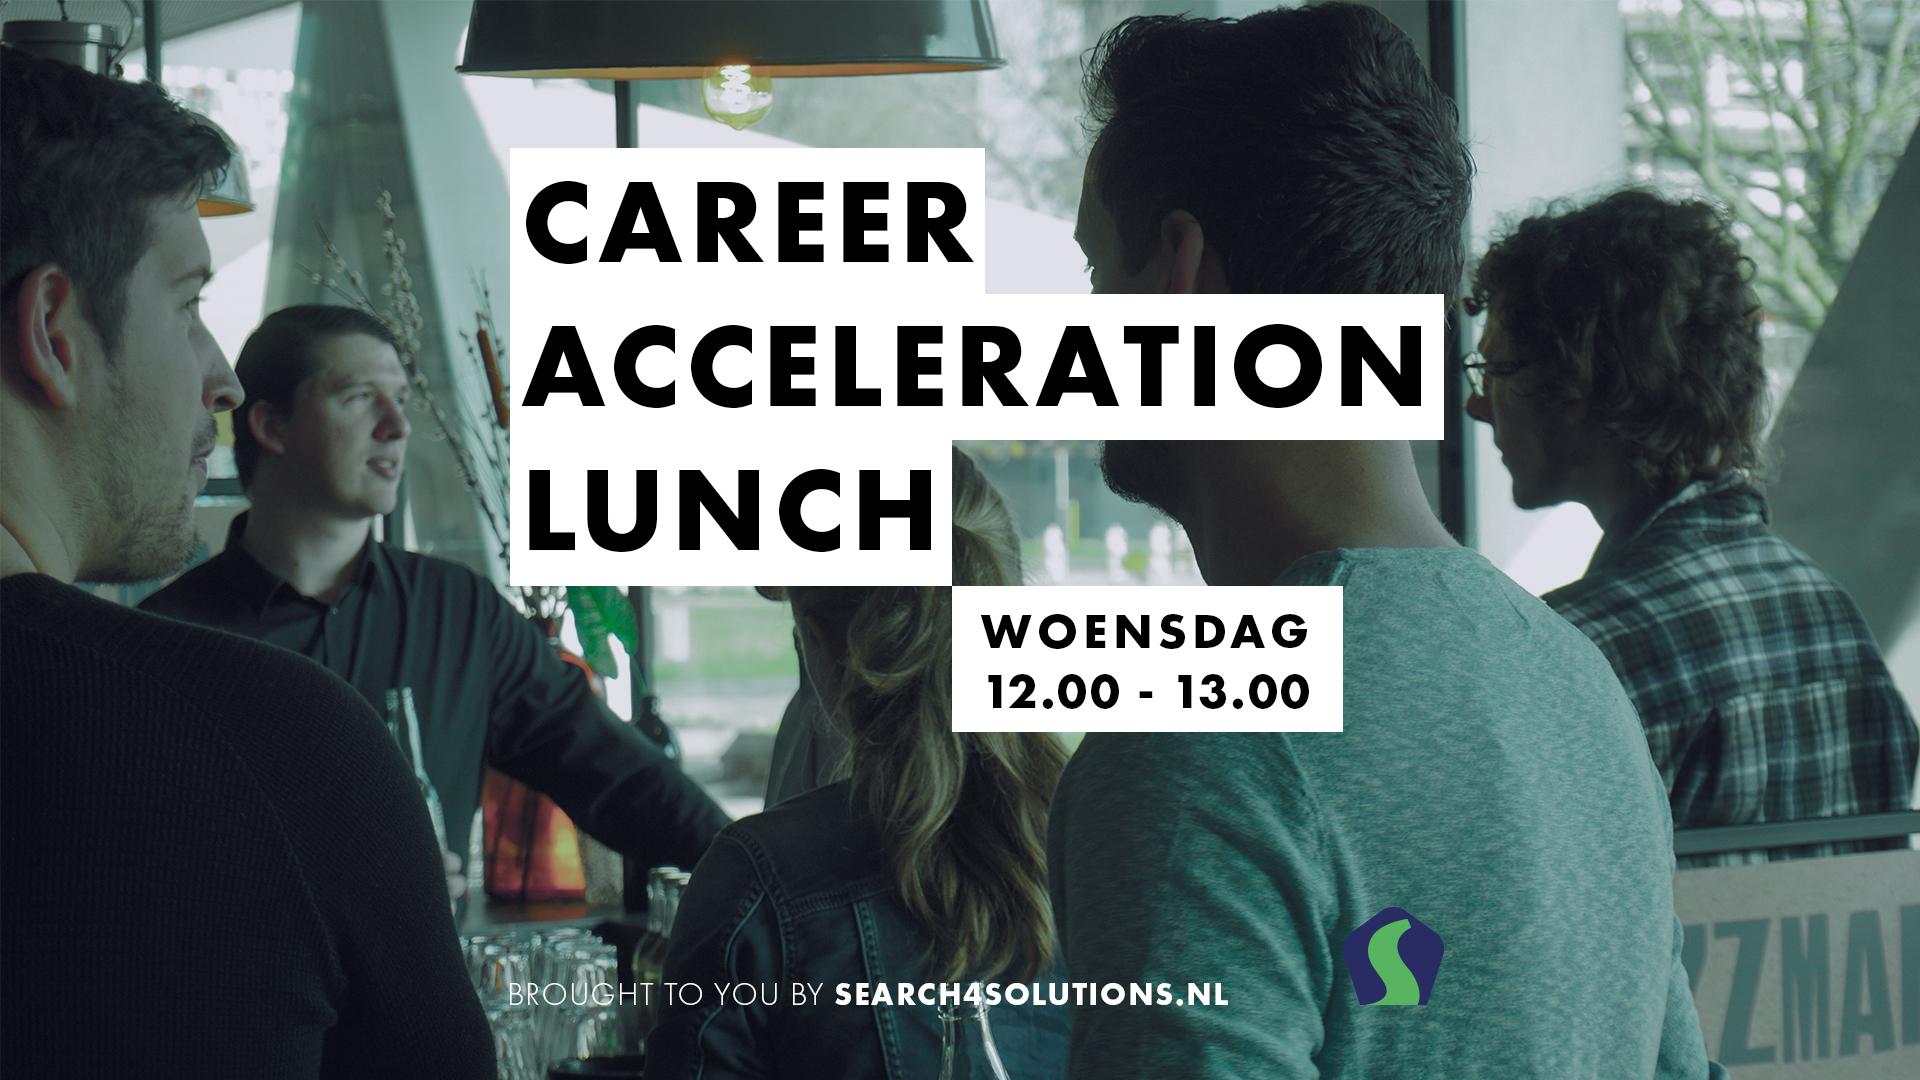 career_acceleration_lunch-16-9.jpg